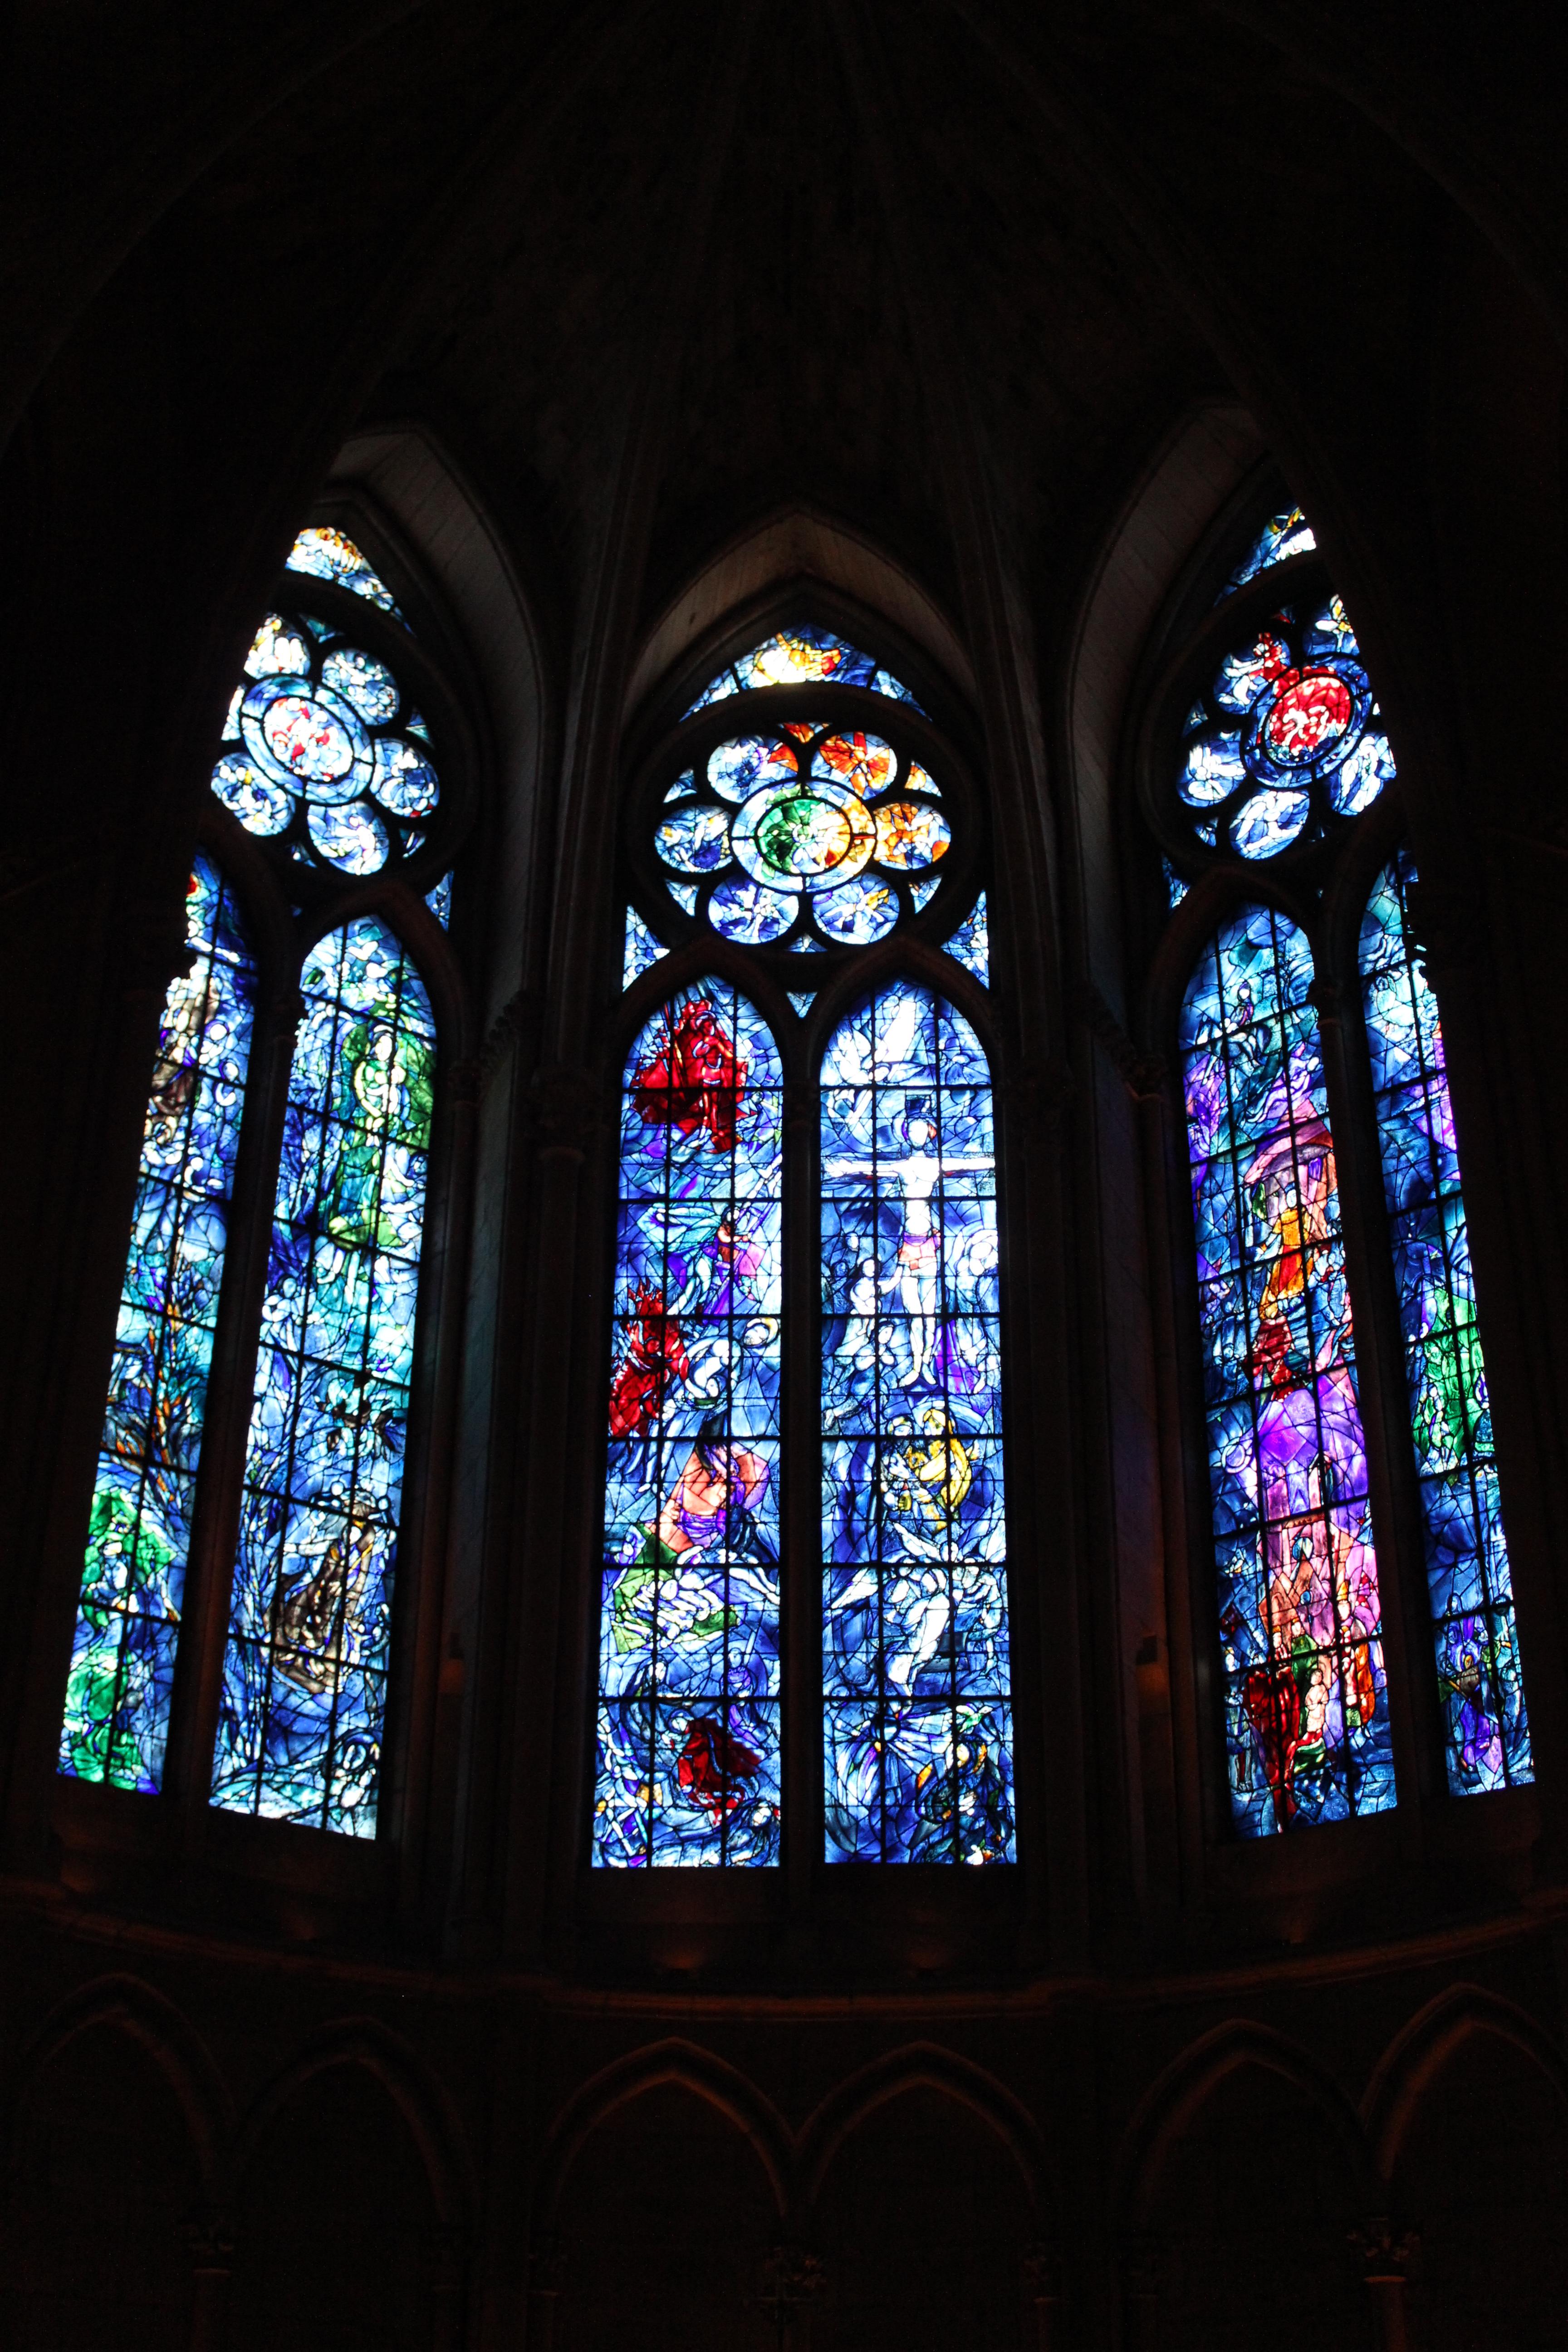 Datei reims fenster marc chagall jpg wikipedia for Fenster wiki